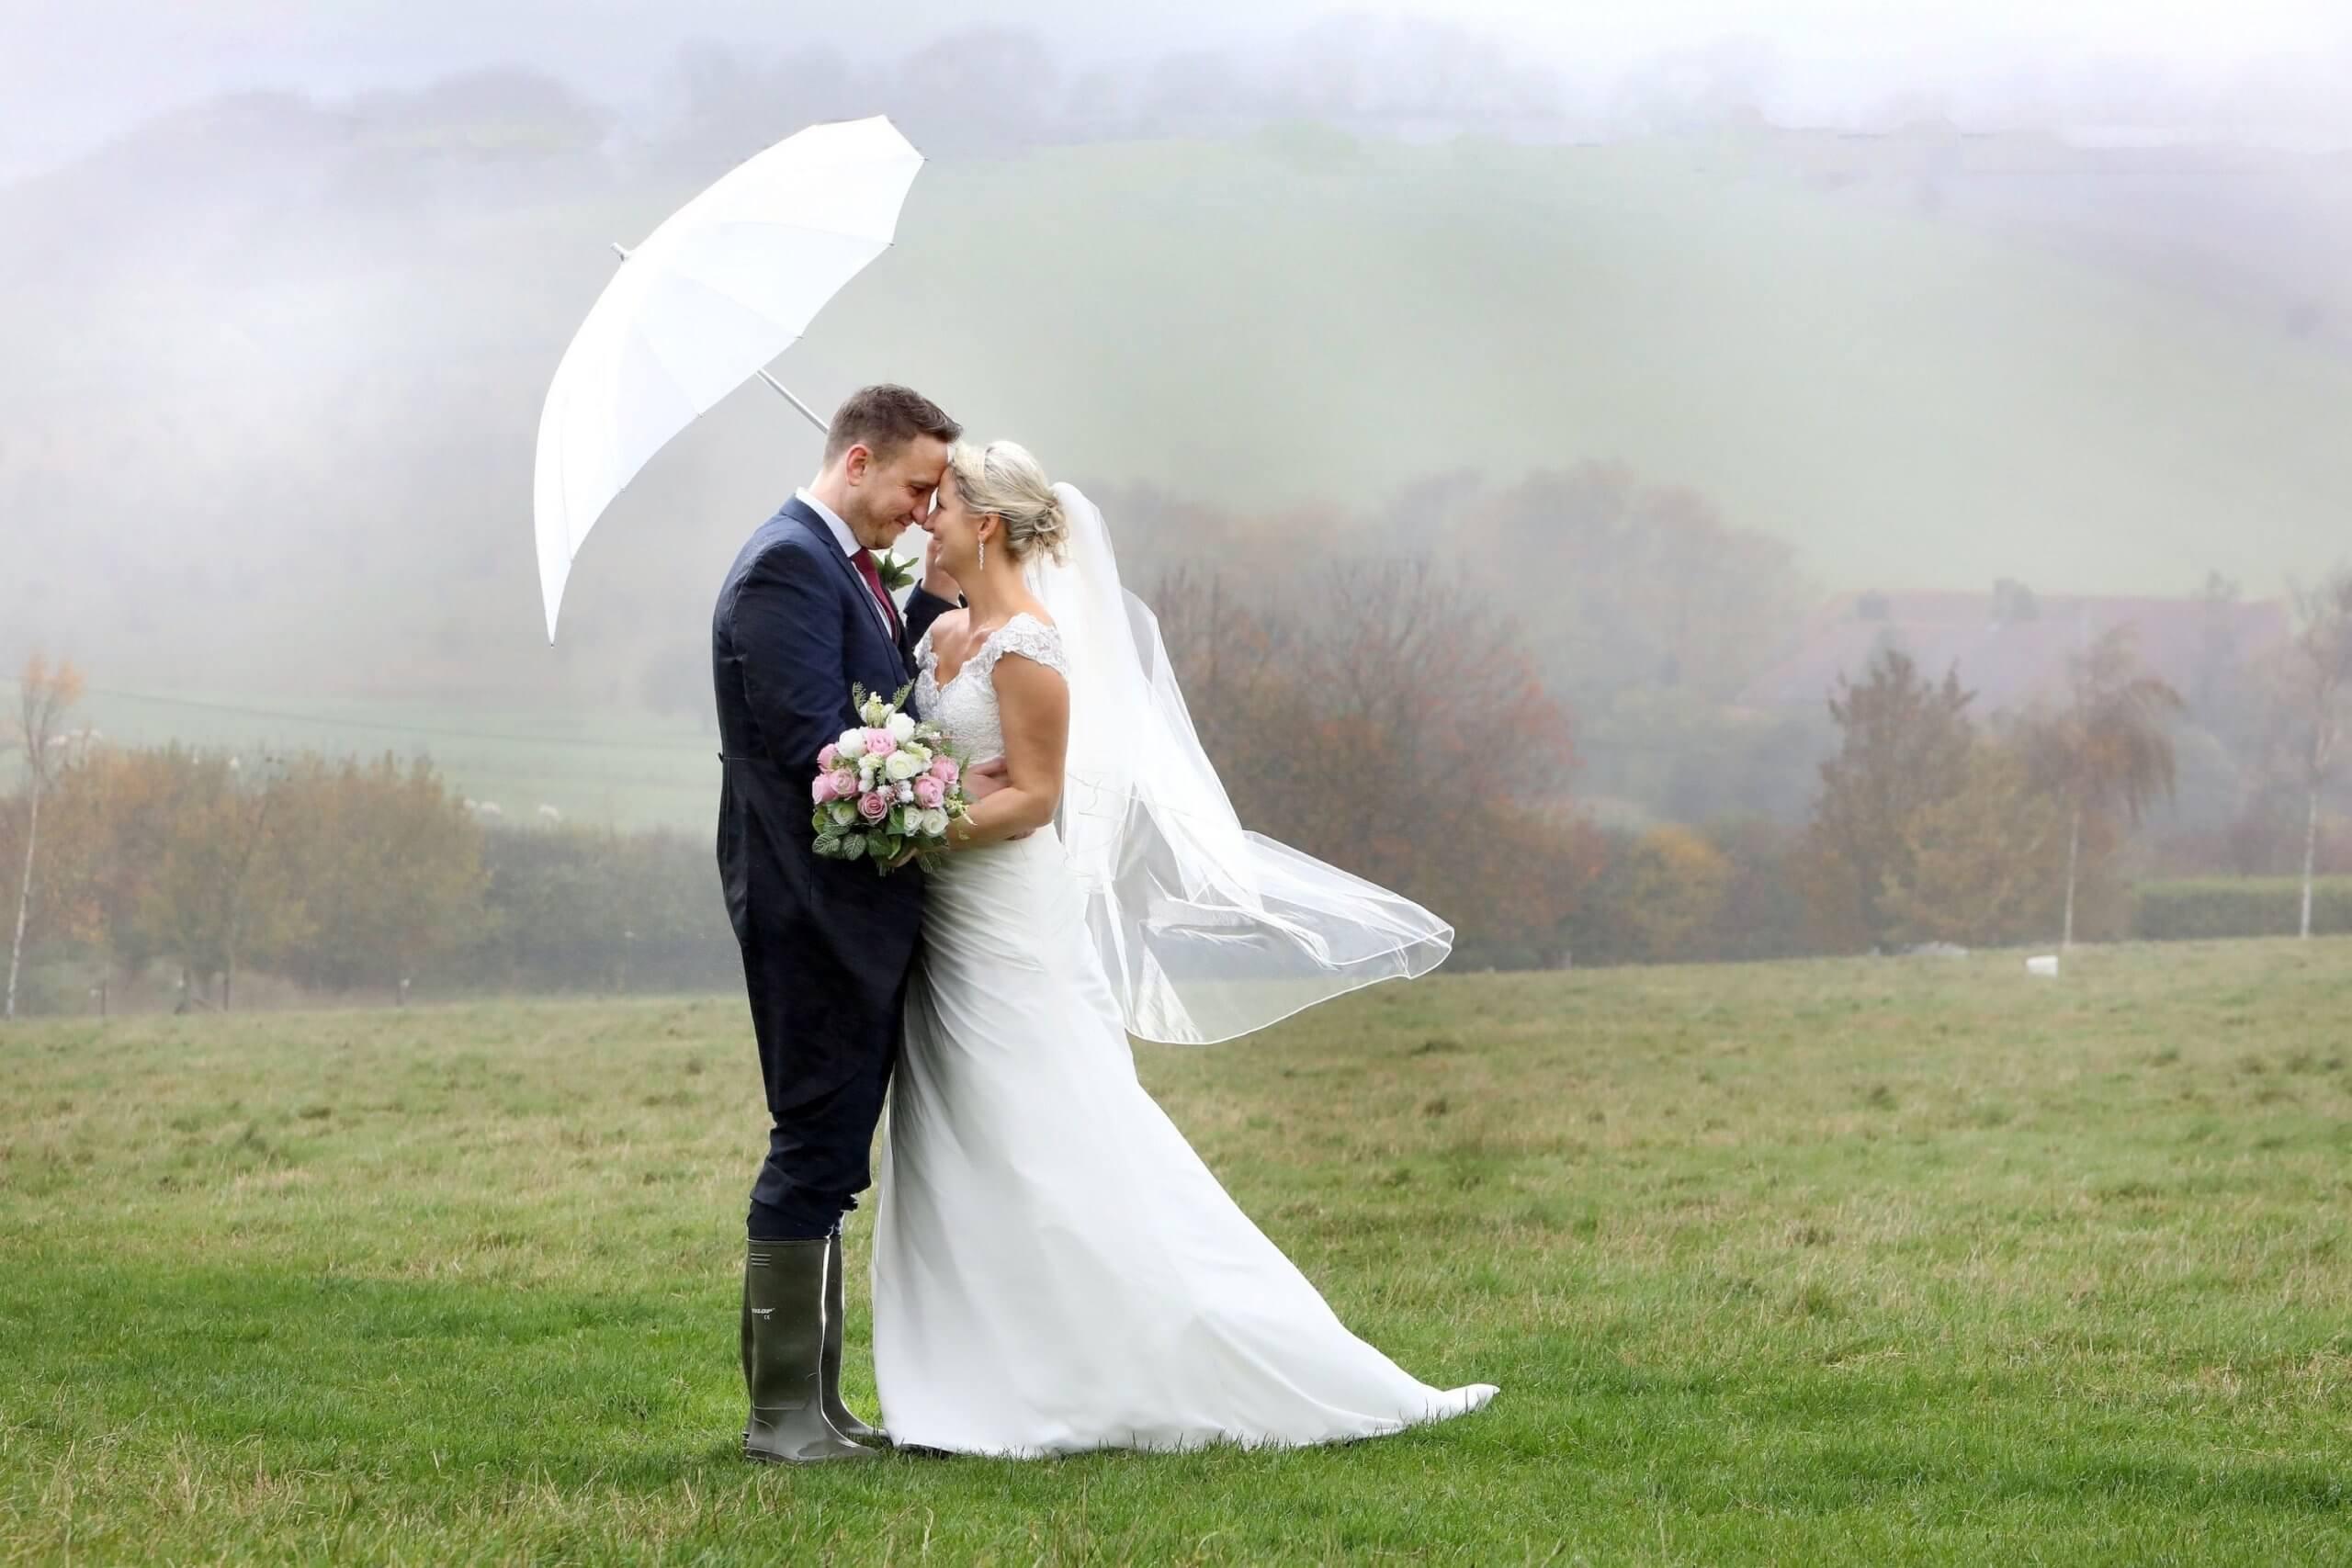 Wedding photographer Upwaltham Barns Winter umbrella